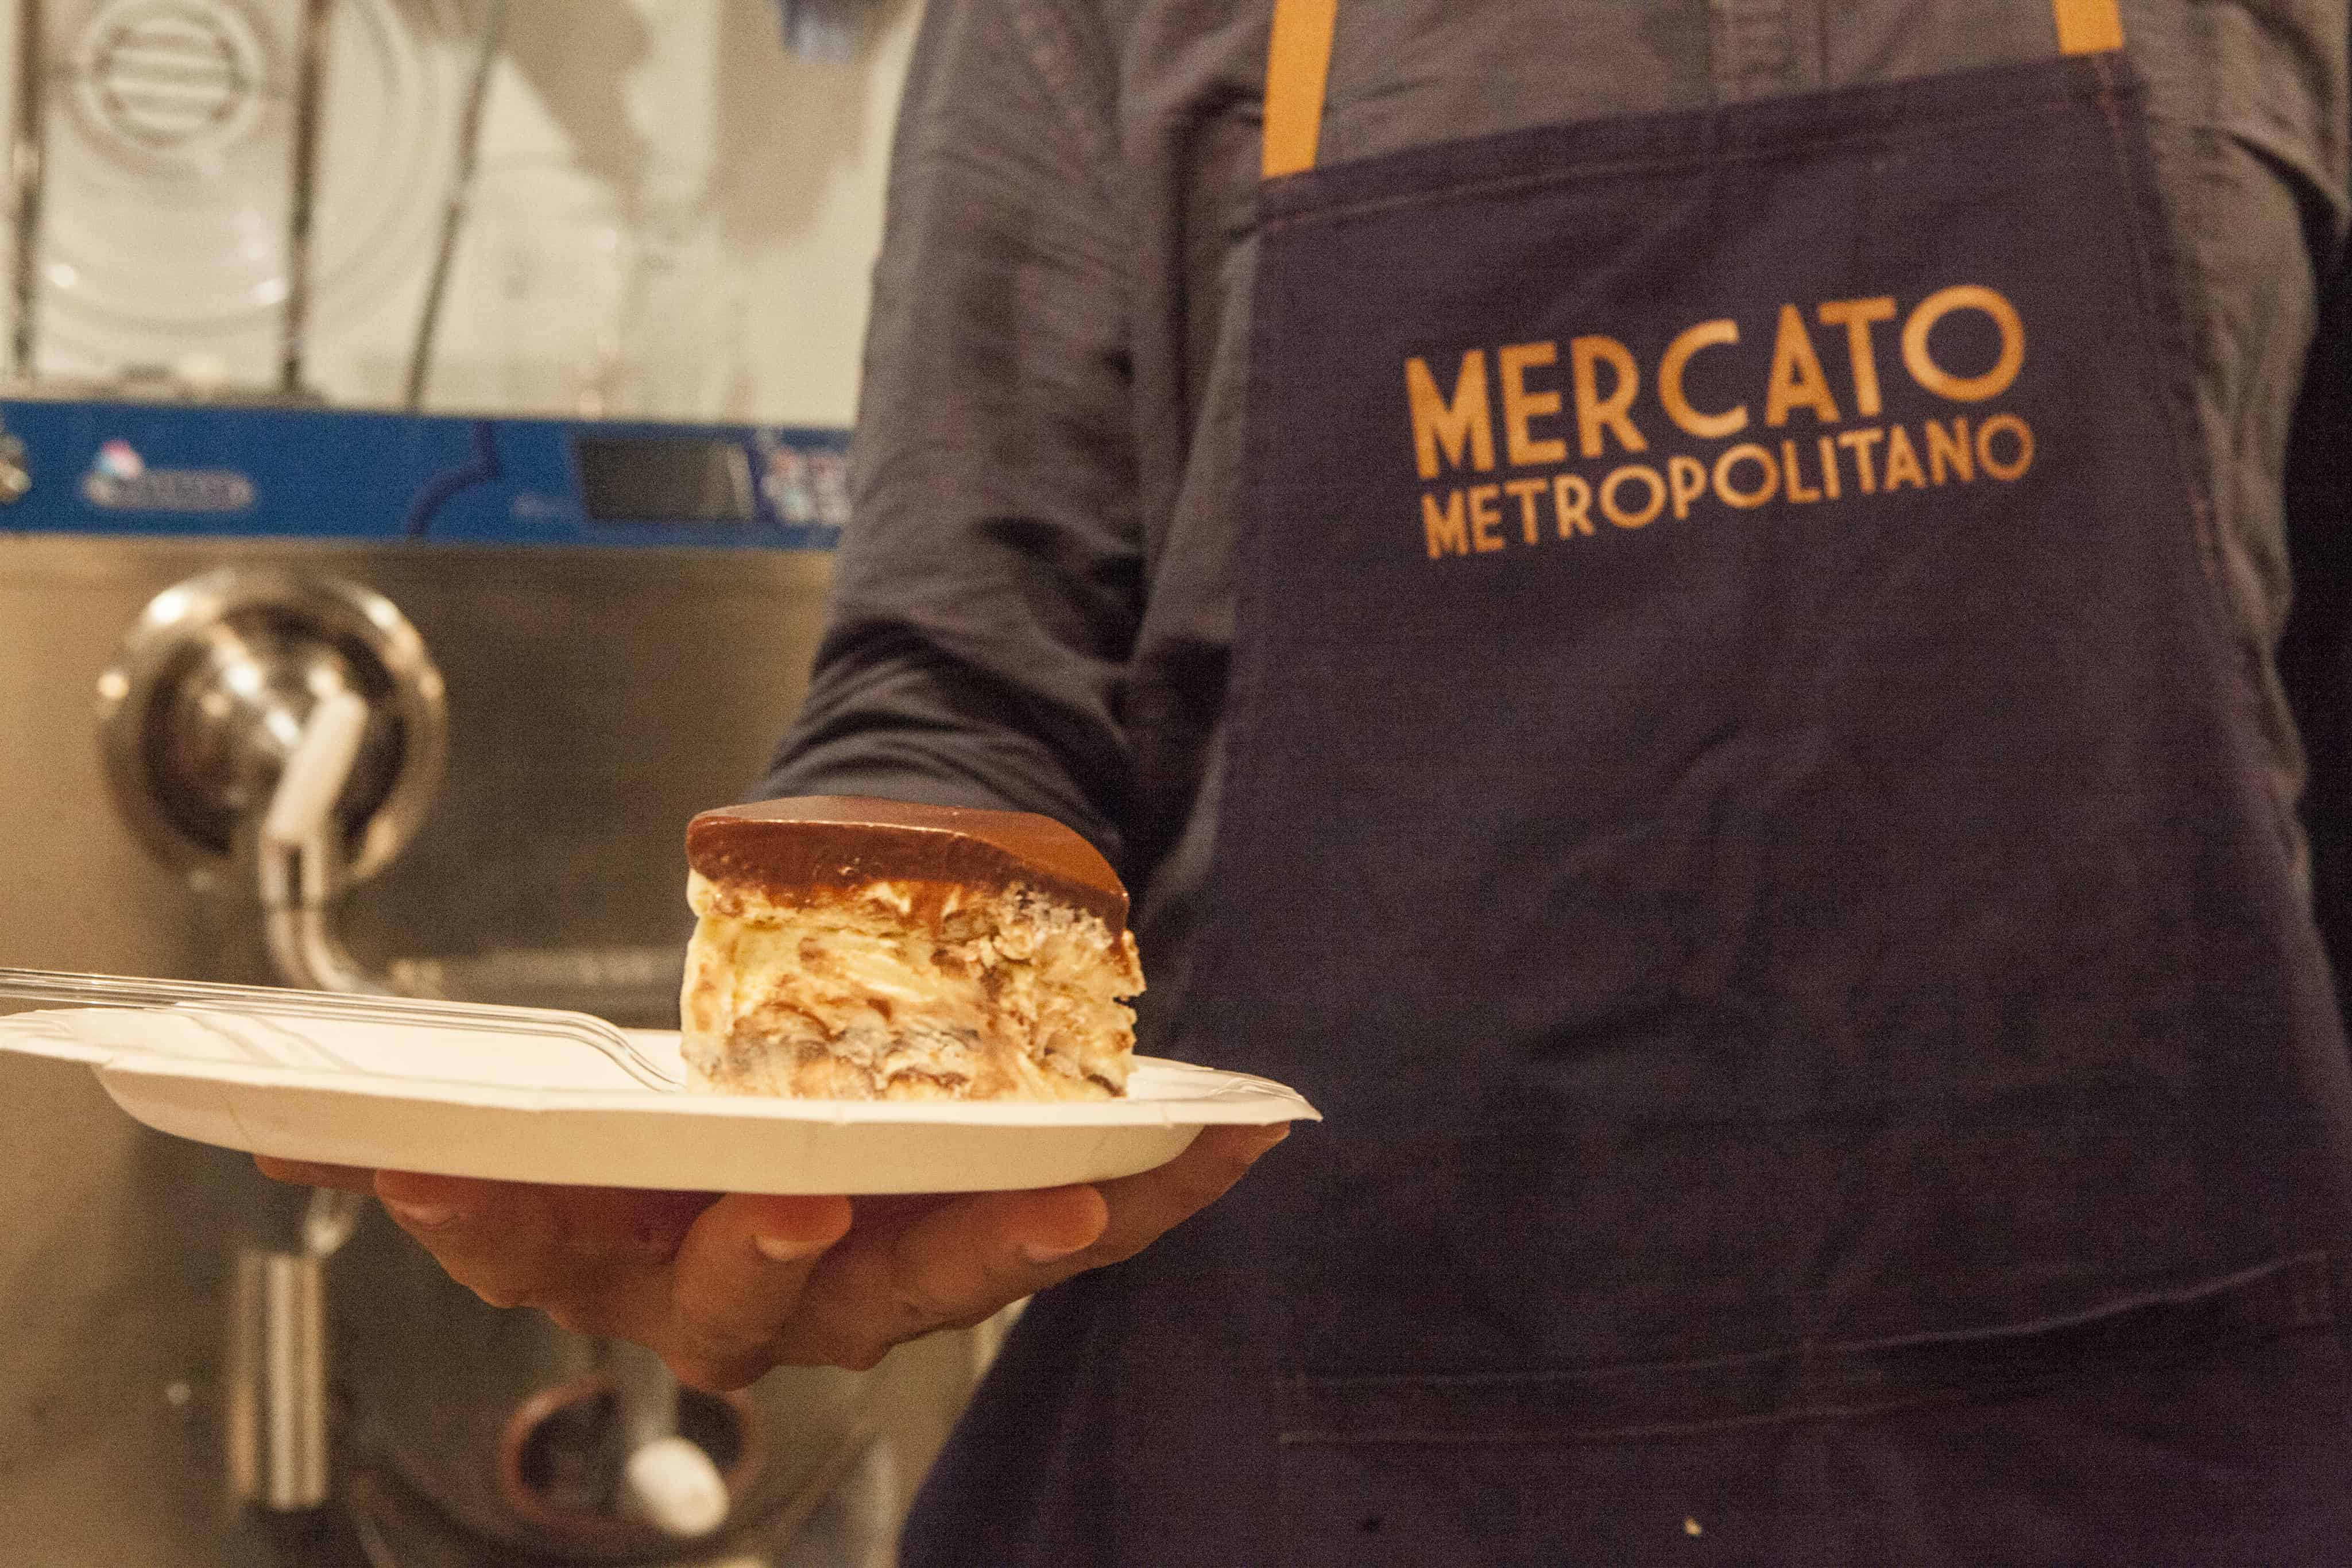 Street food feast at the Mercato